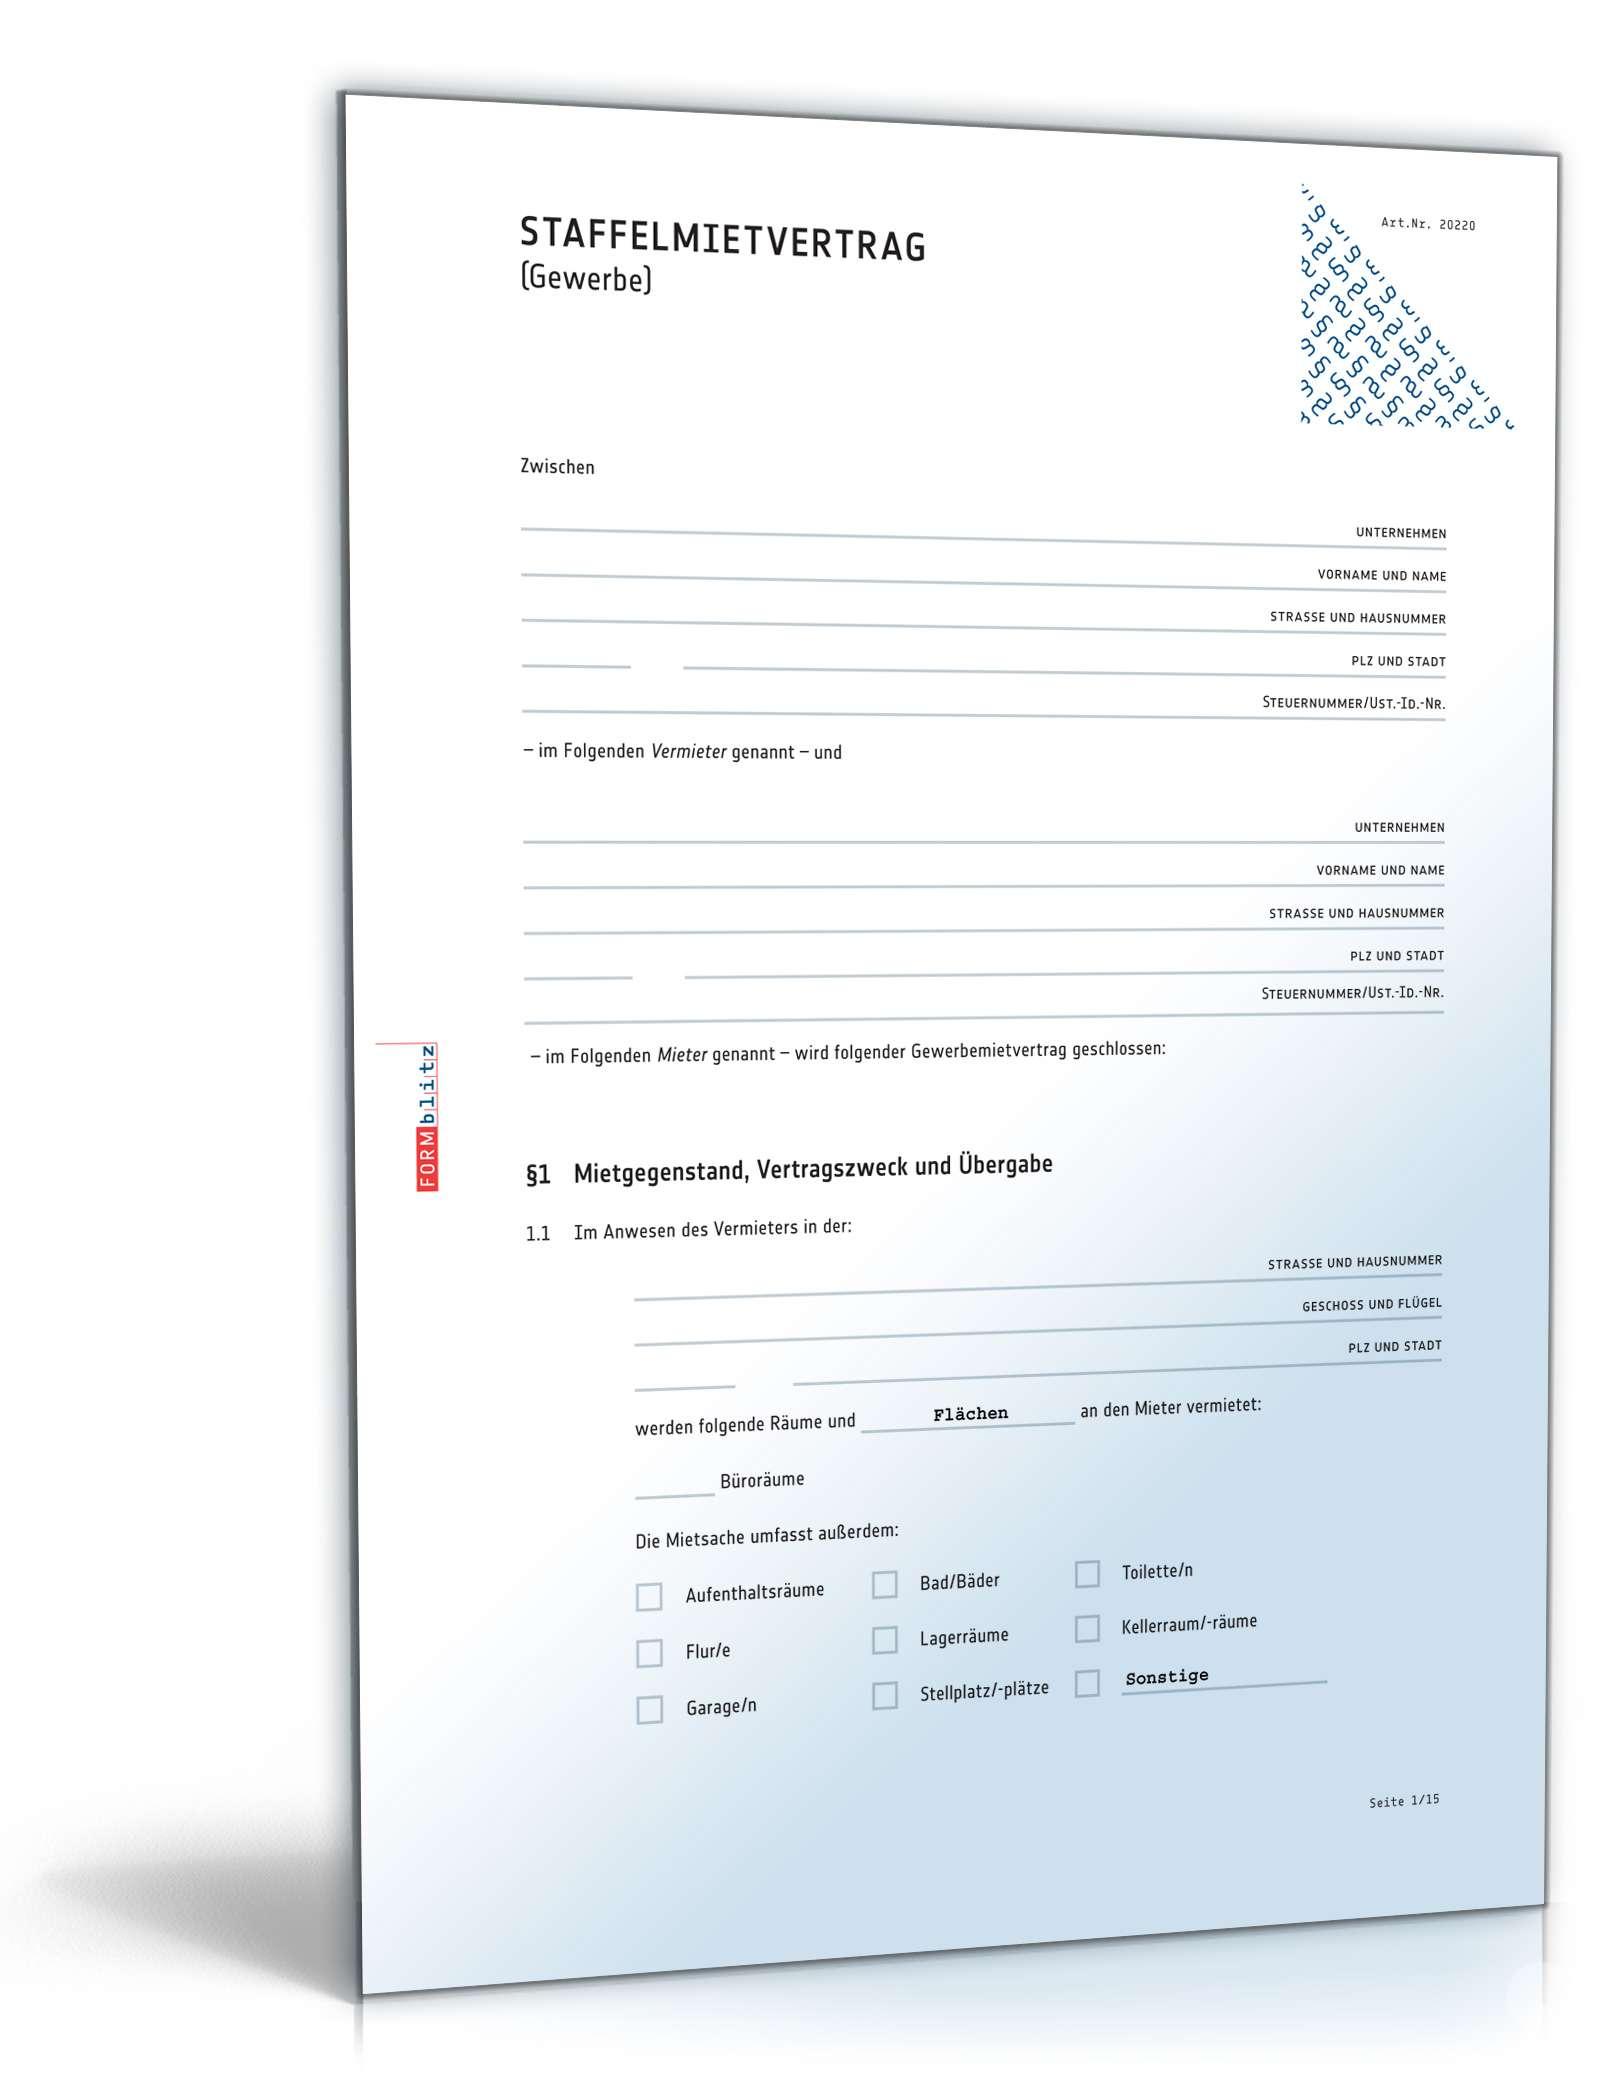 Staffelmietvertrag Gewerbe Rechtssicheres Muster Zum Download